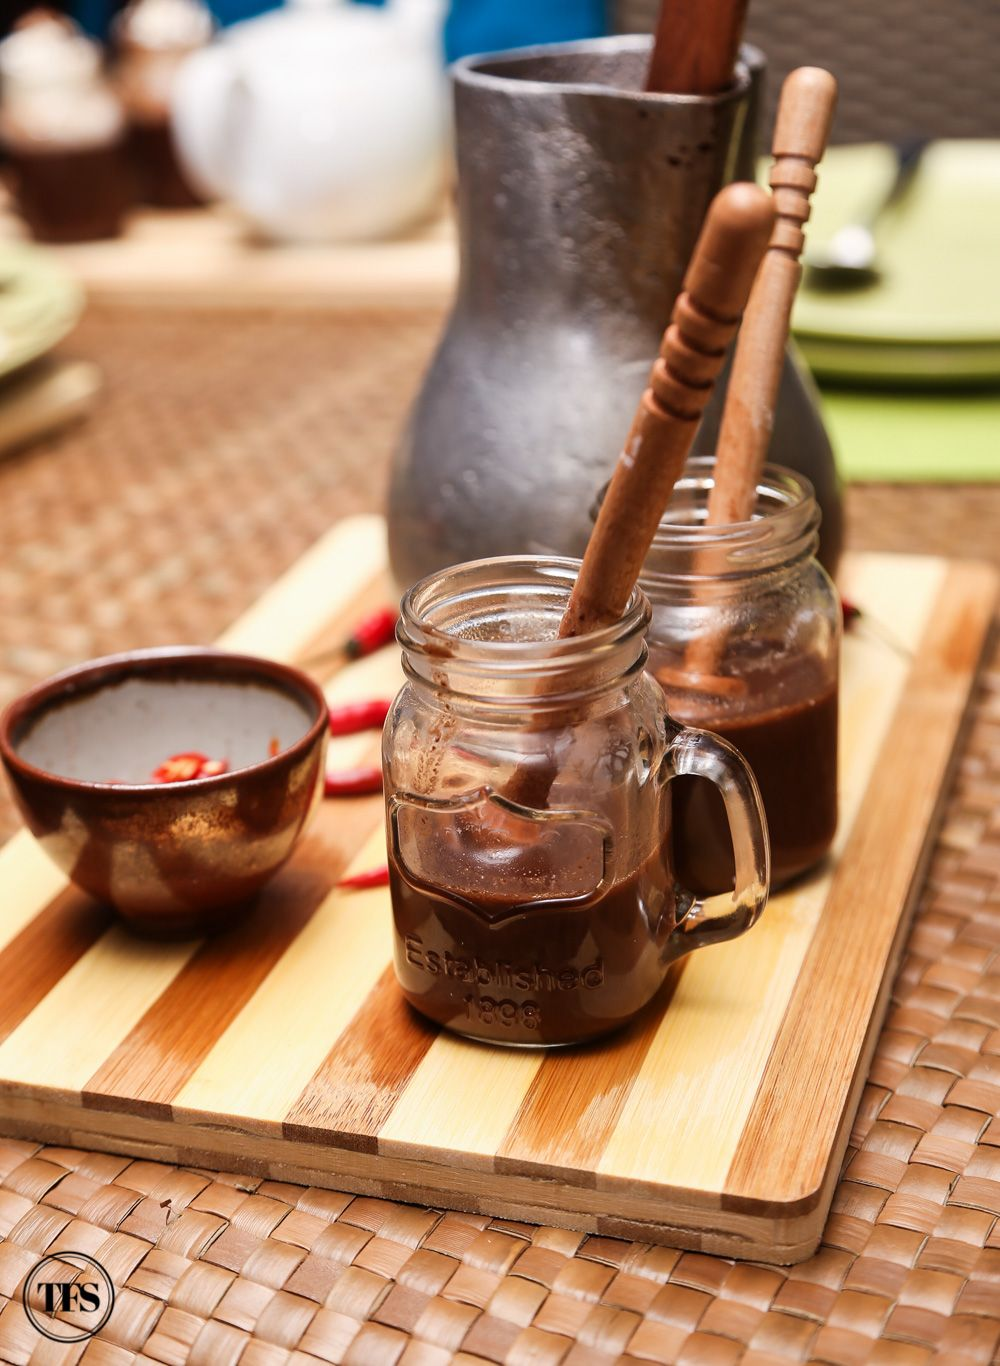 Hot Tablea Chocolate Drink